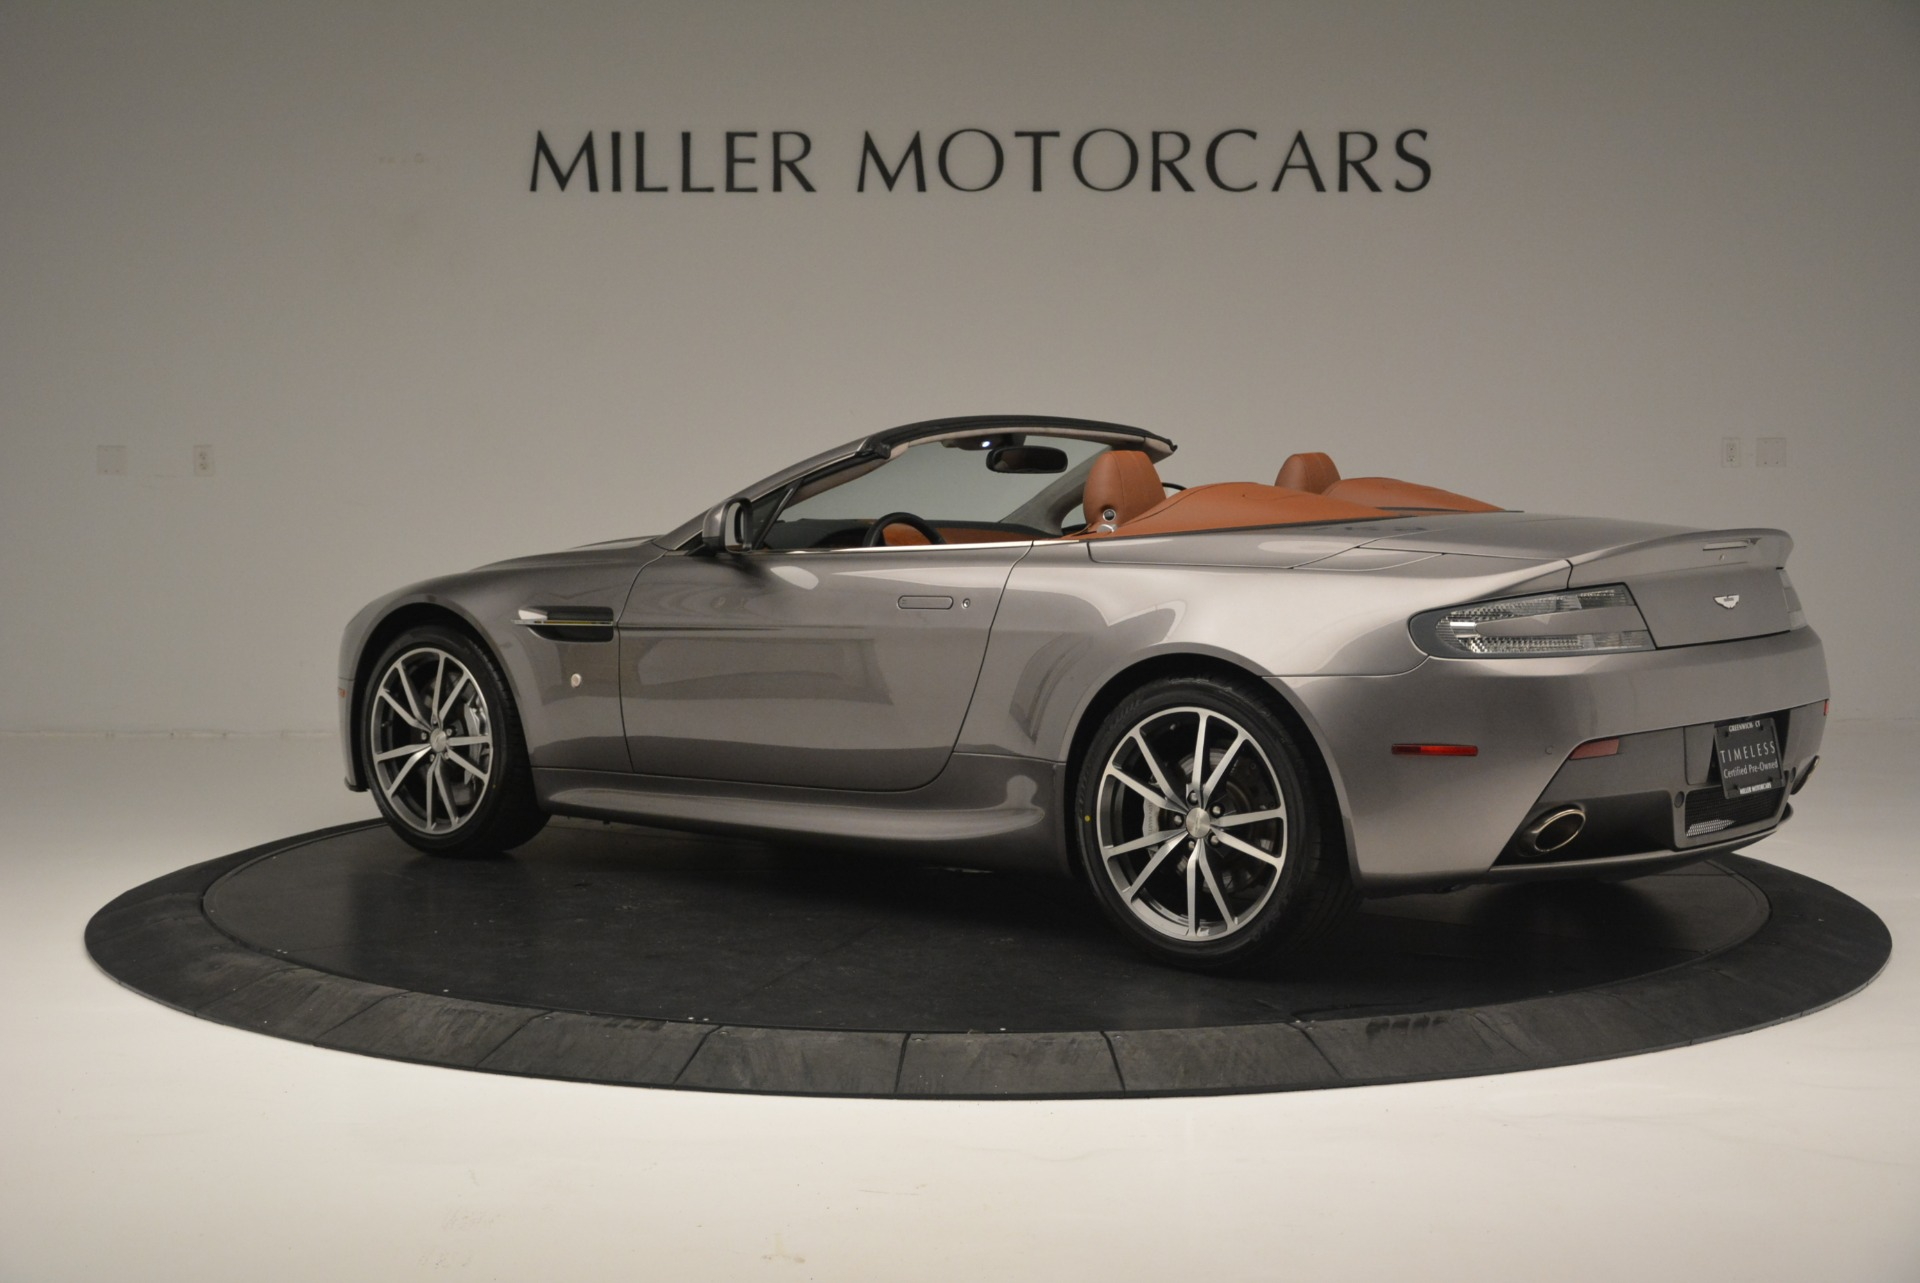 Used 2015 Aston Martin V8 Vantage Roadster For Sale In Greenwich, CT. Alfa Romeo of Greenwich, 7396 2463_p4